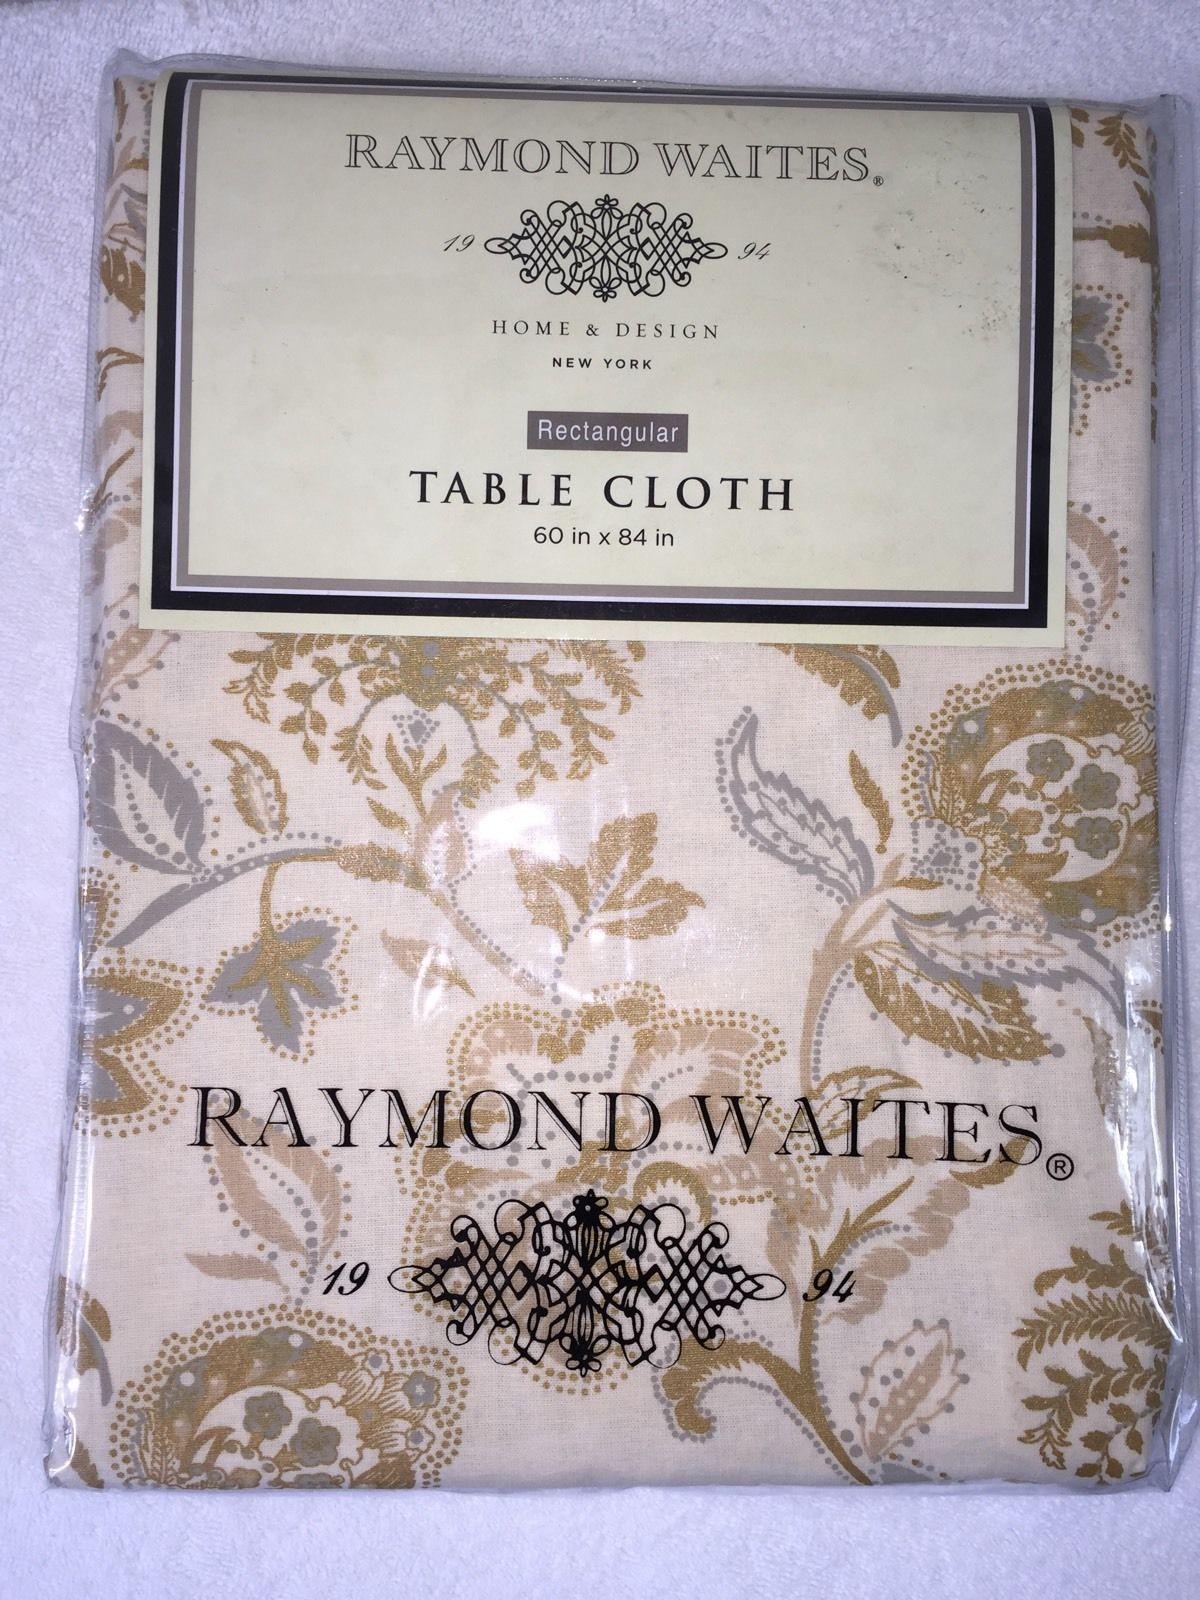 Superbe Raymond Waites Tablecloth 60 X 84 Oblong Cream Gold Gray